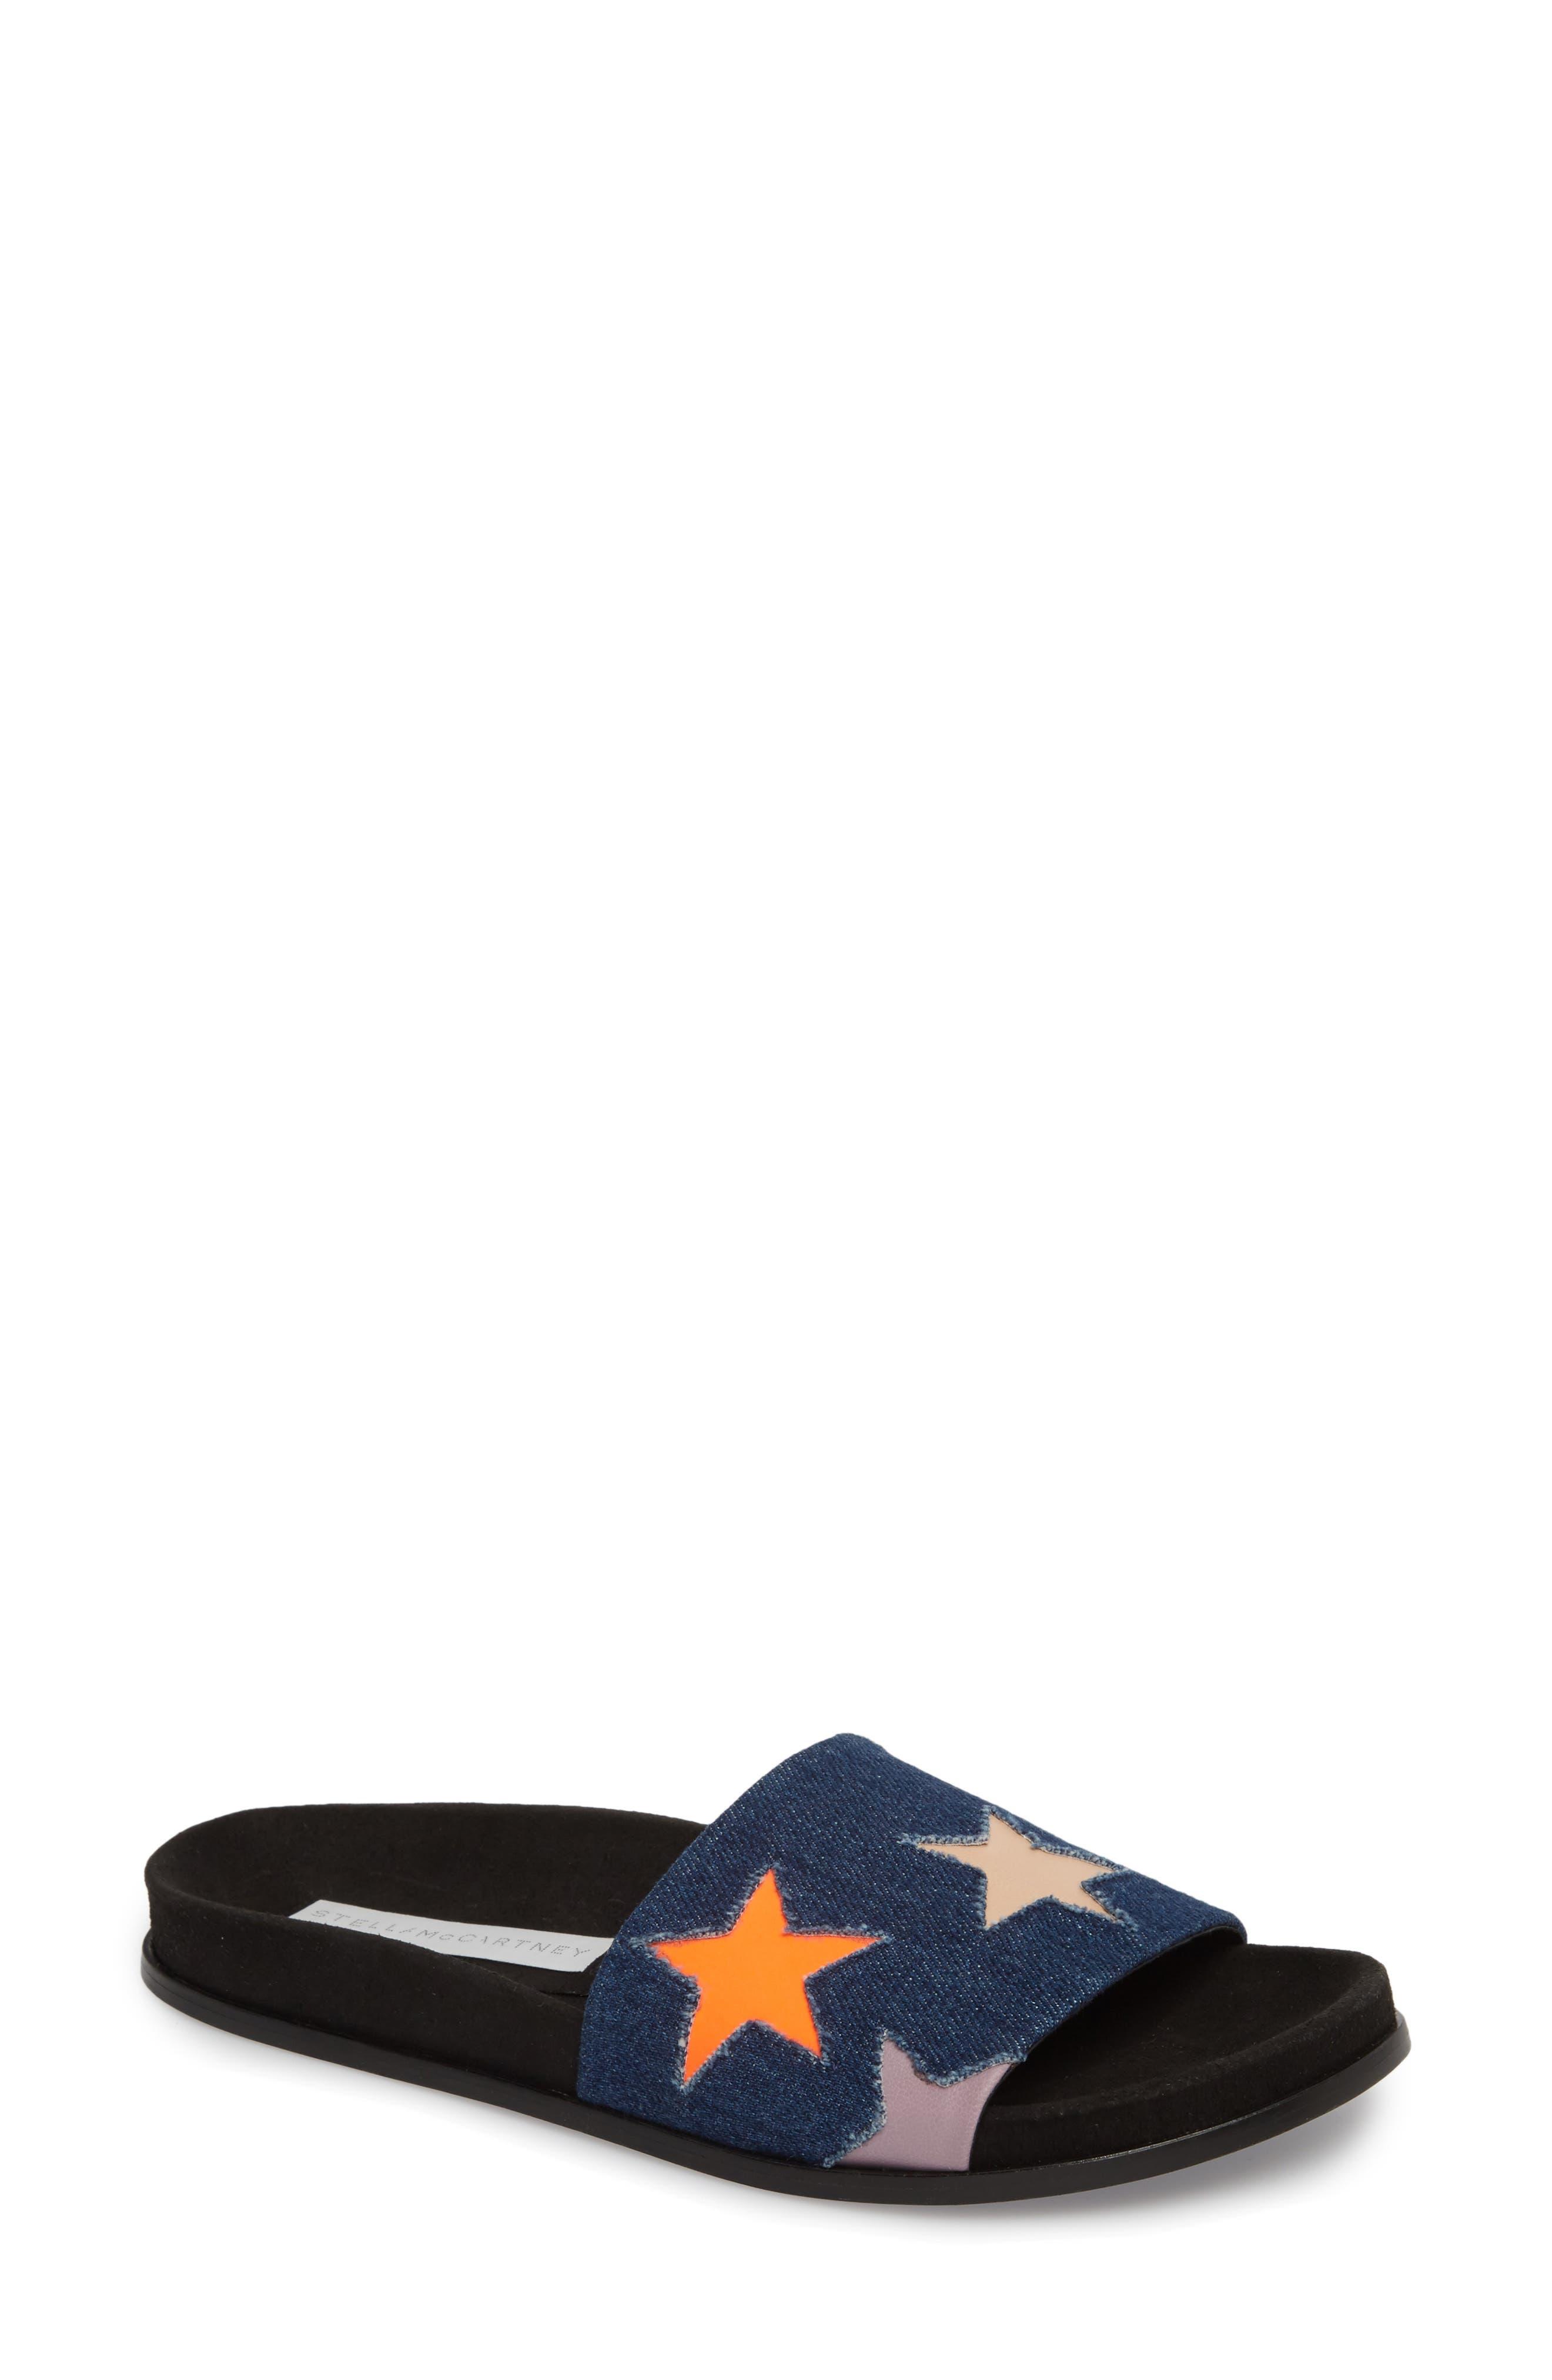 Star Slide Sandal,                         Main,                         color, Navy